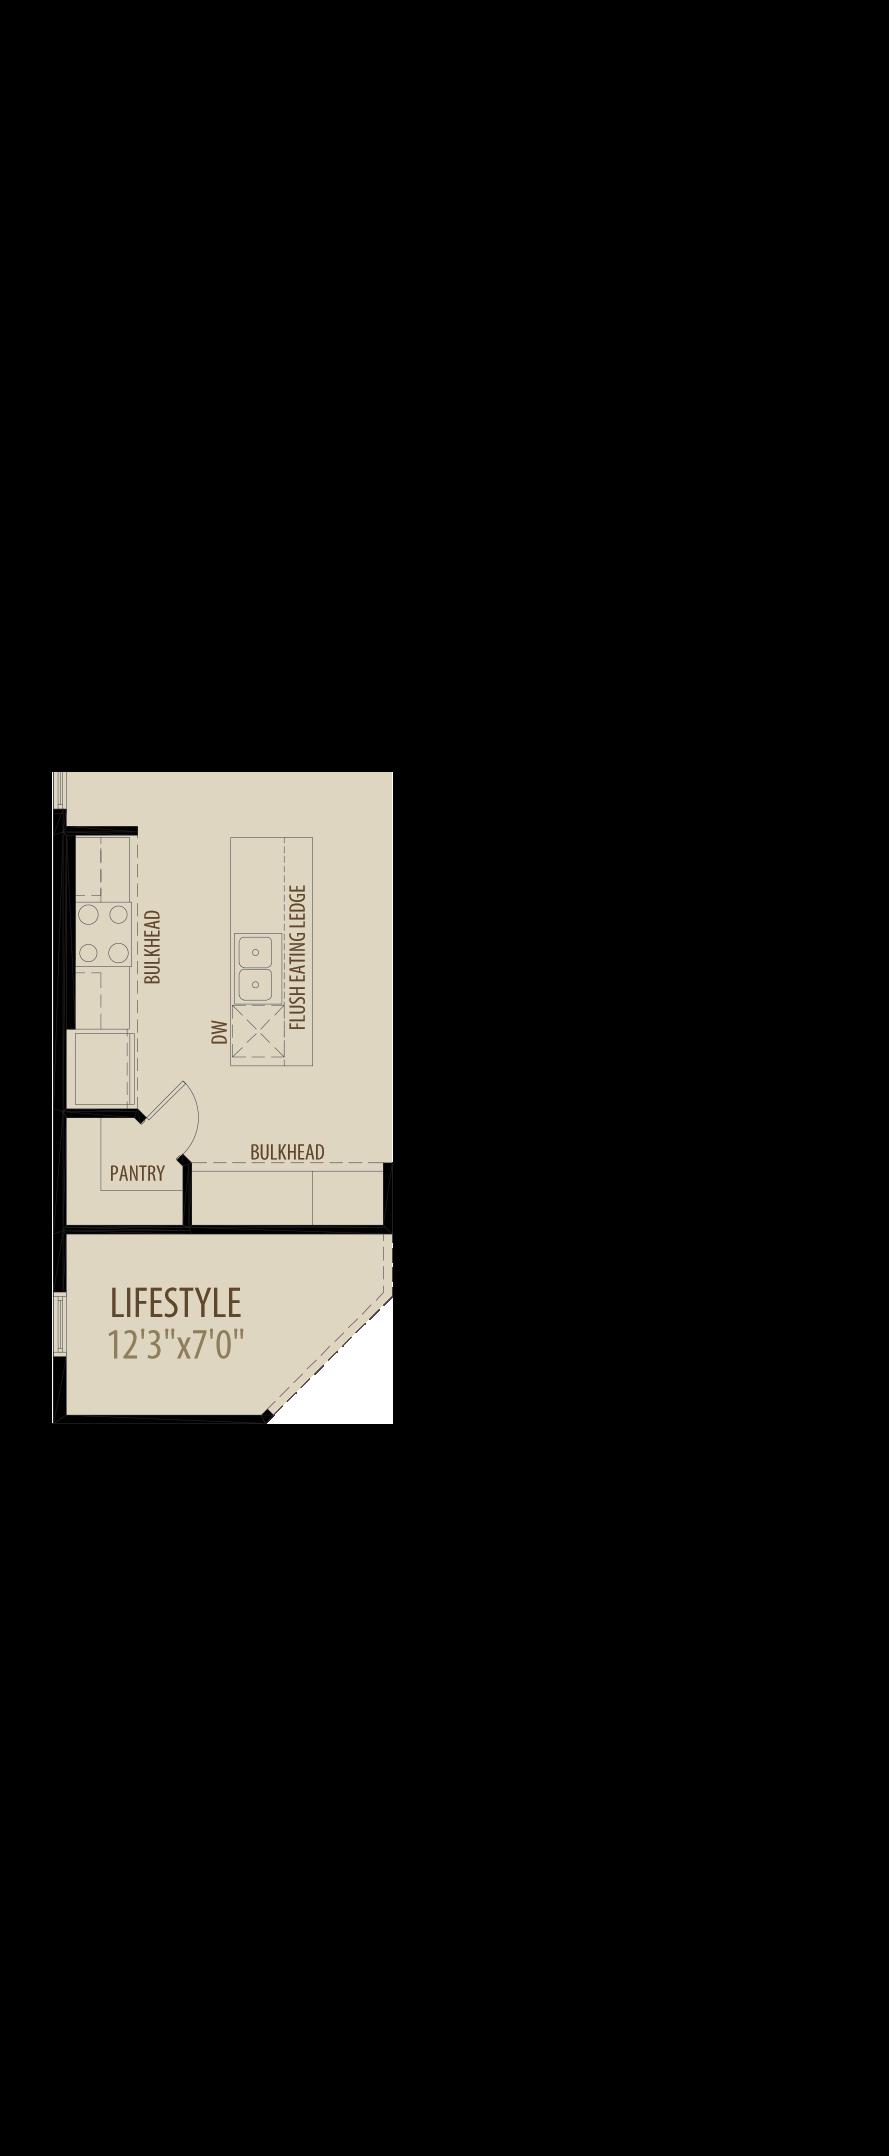 Lifestyle Room